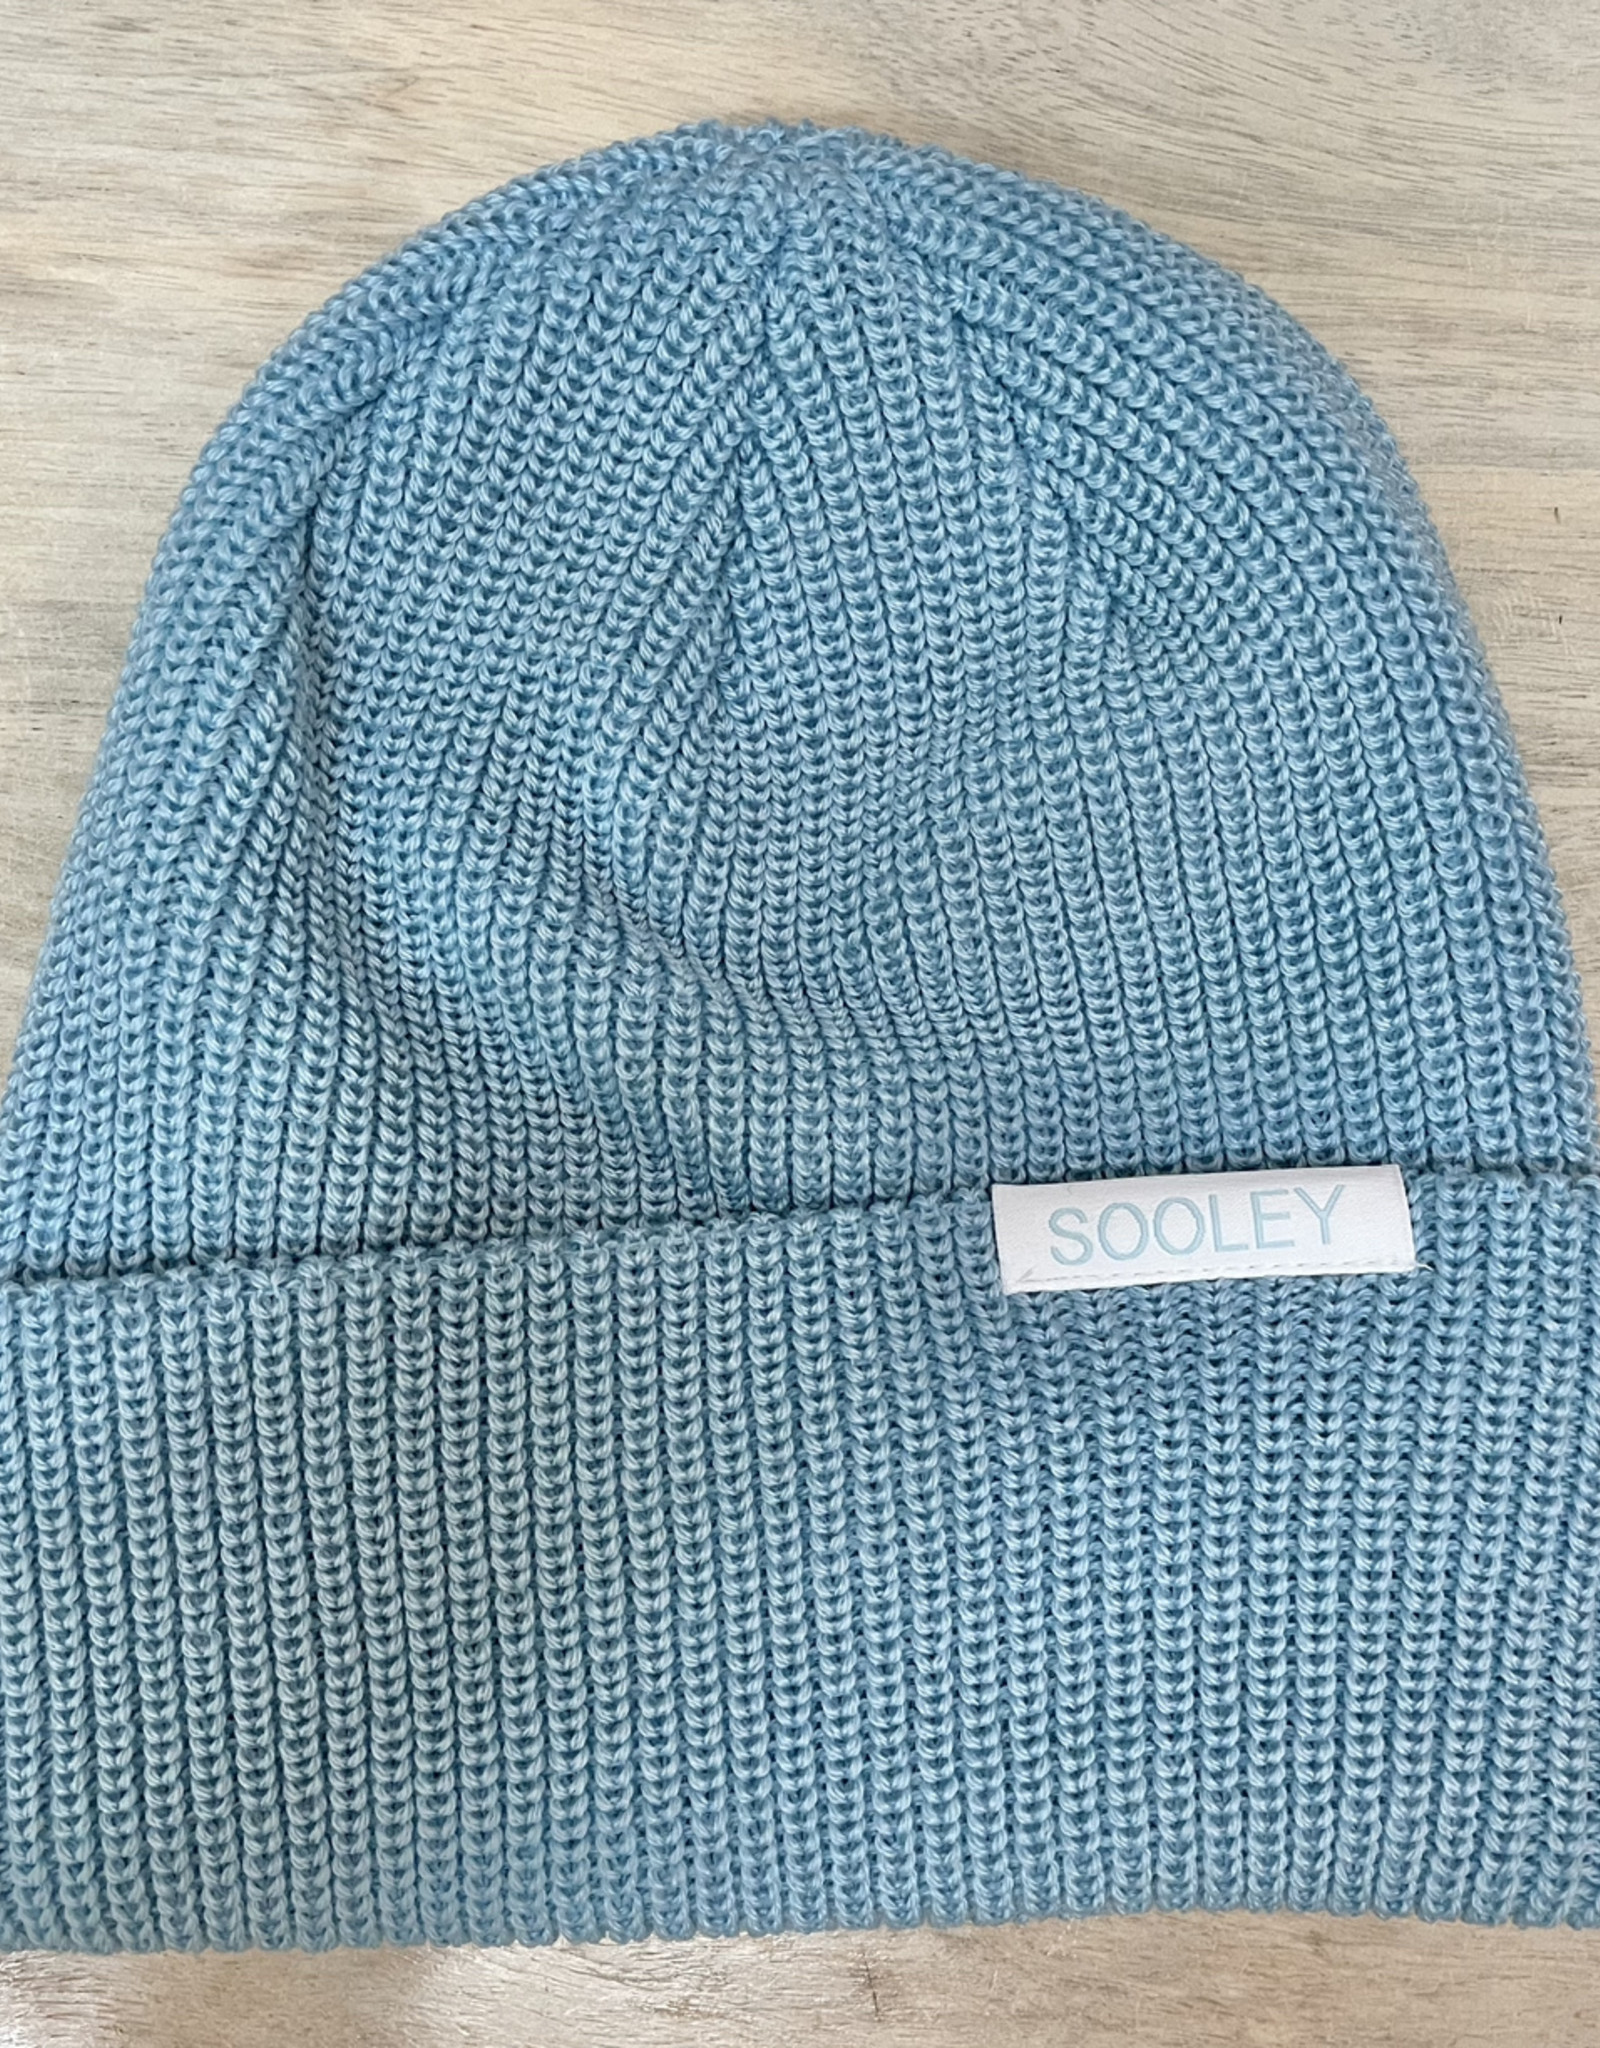 Merino Wool Toques